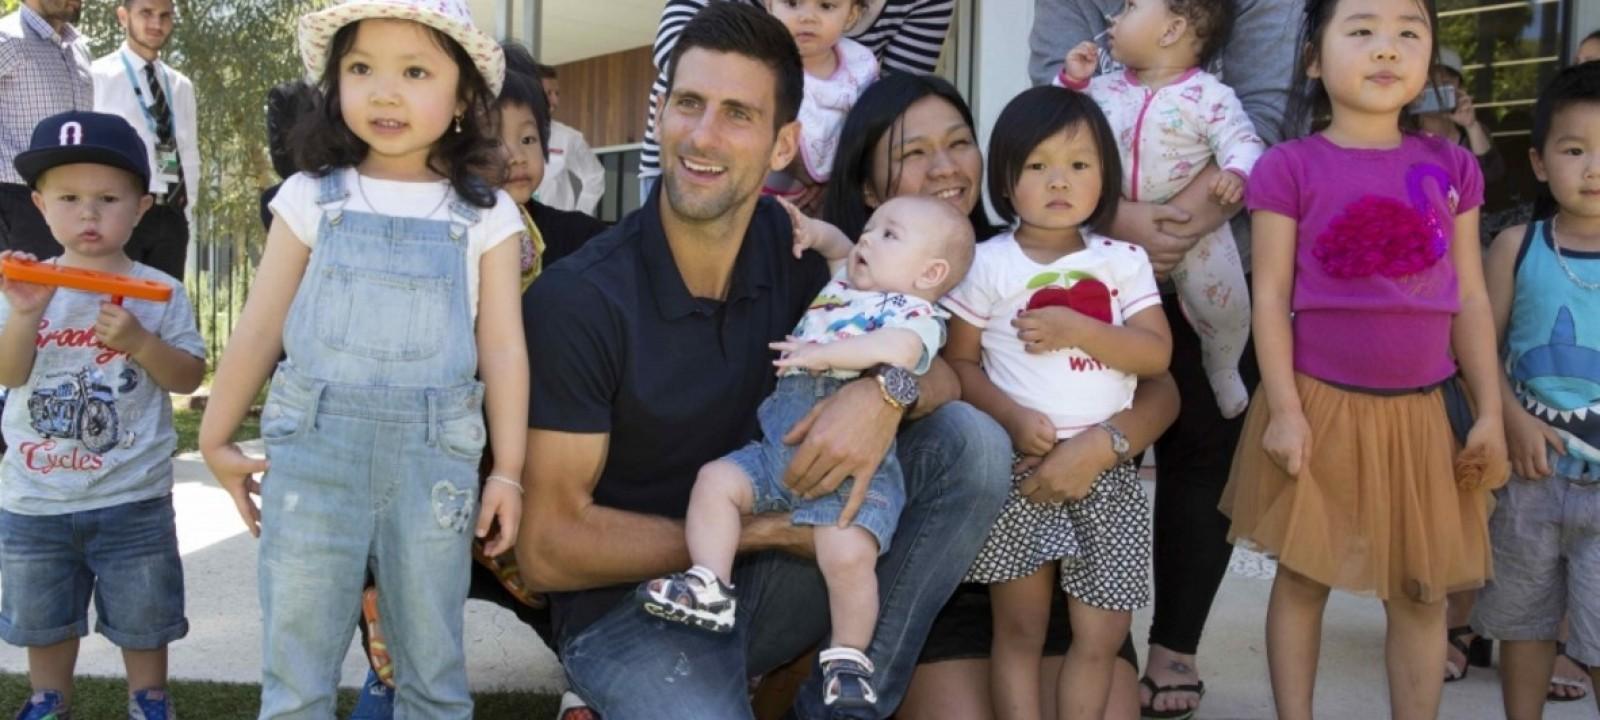 Novak Djokovic Foundation Charitystars